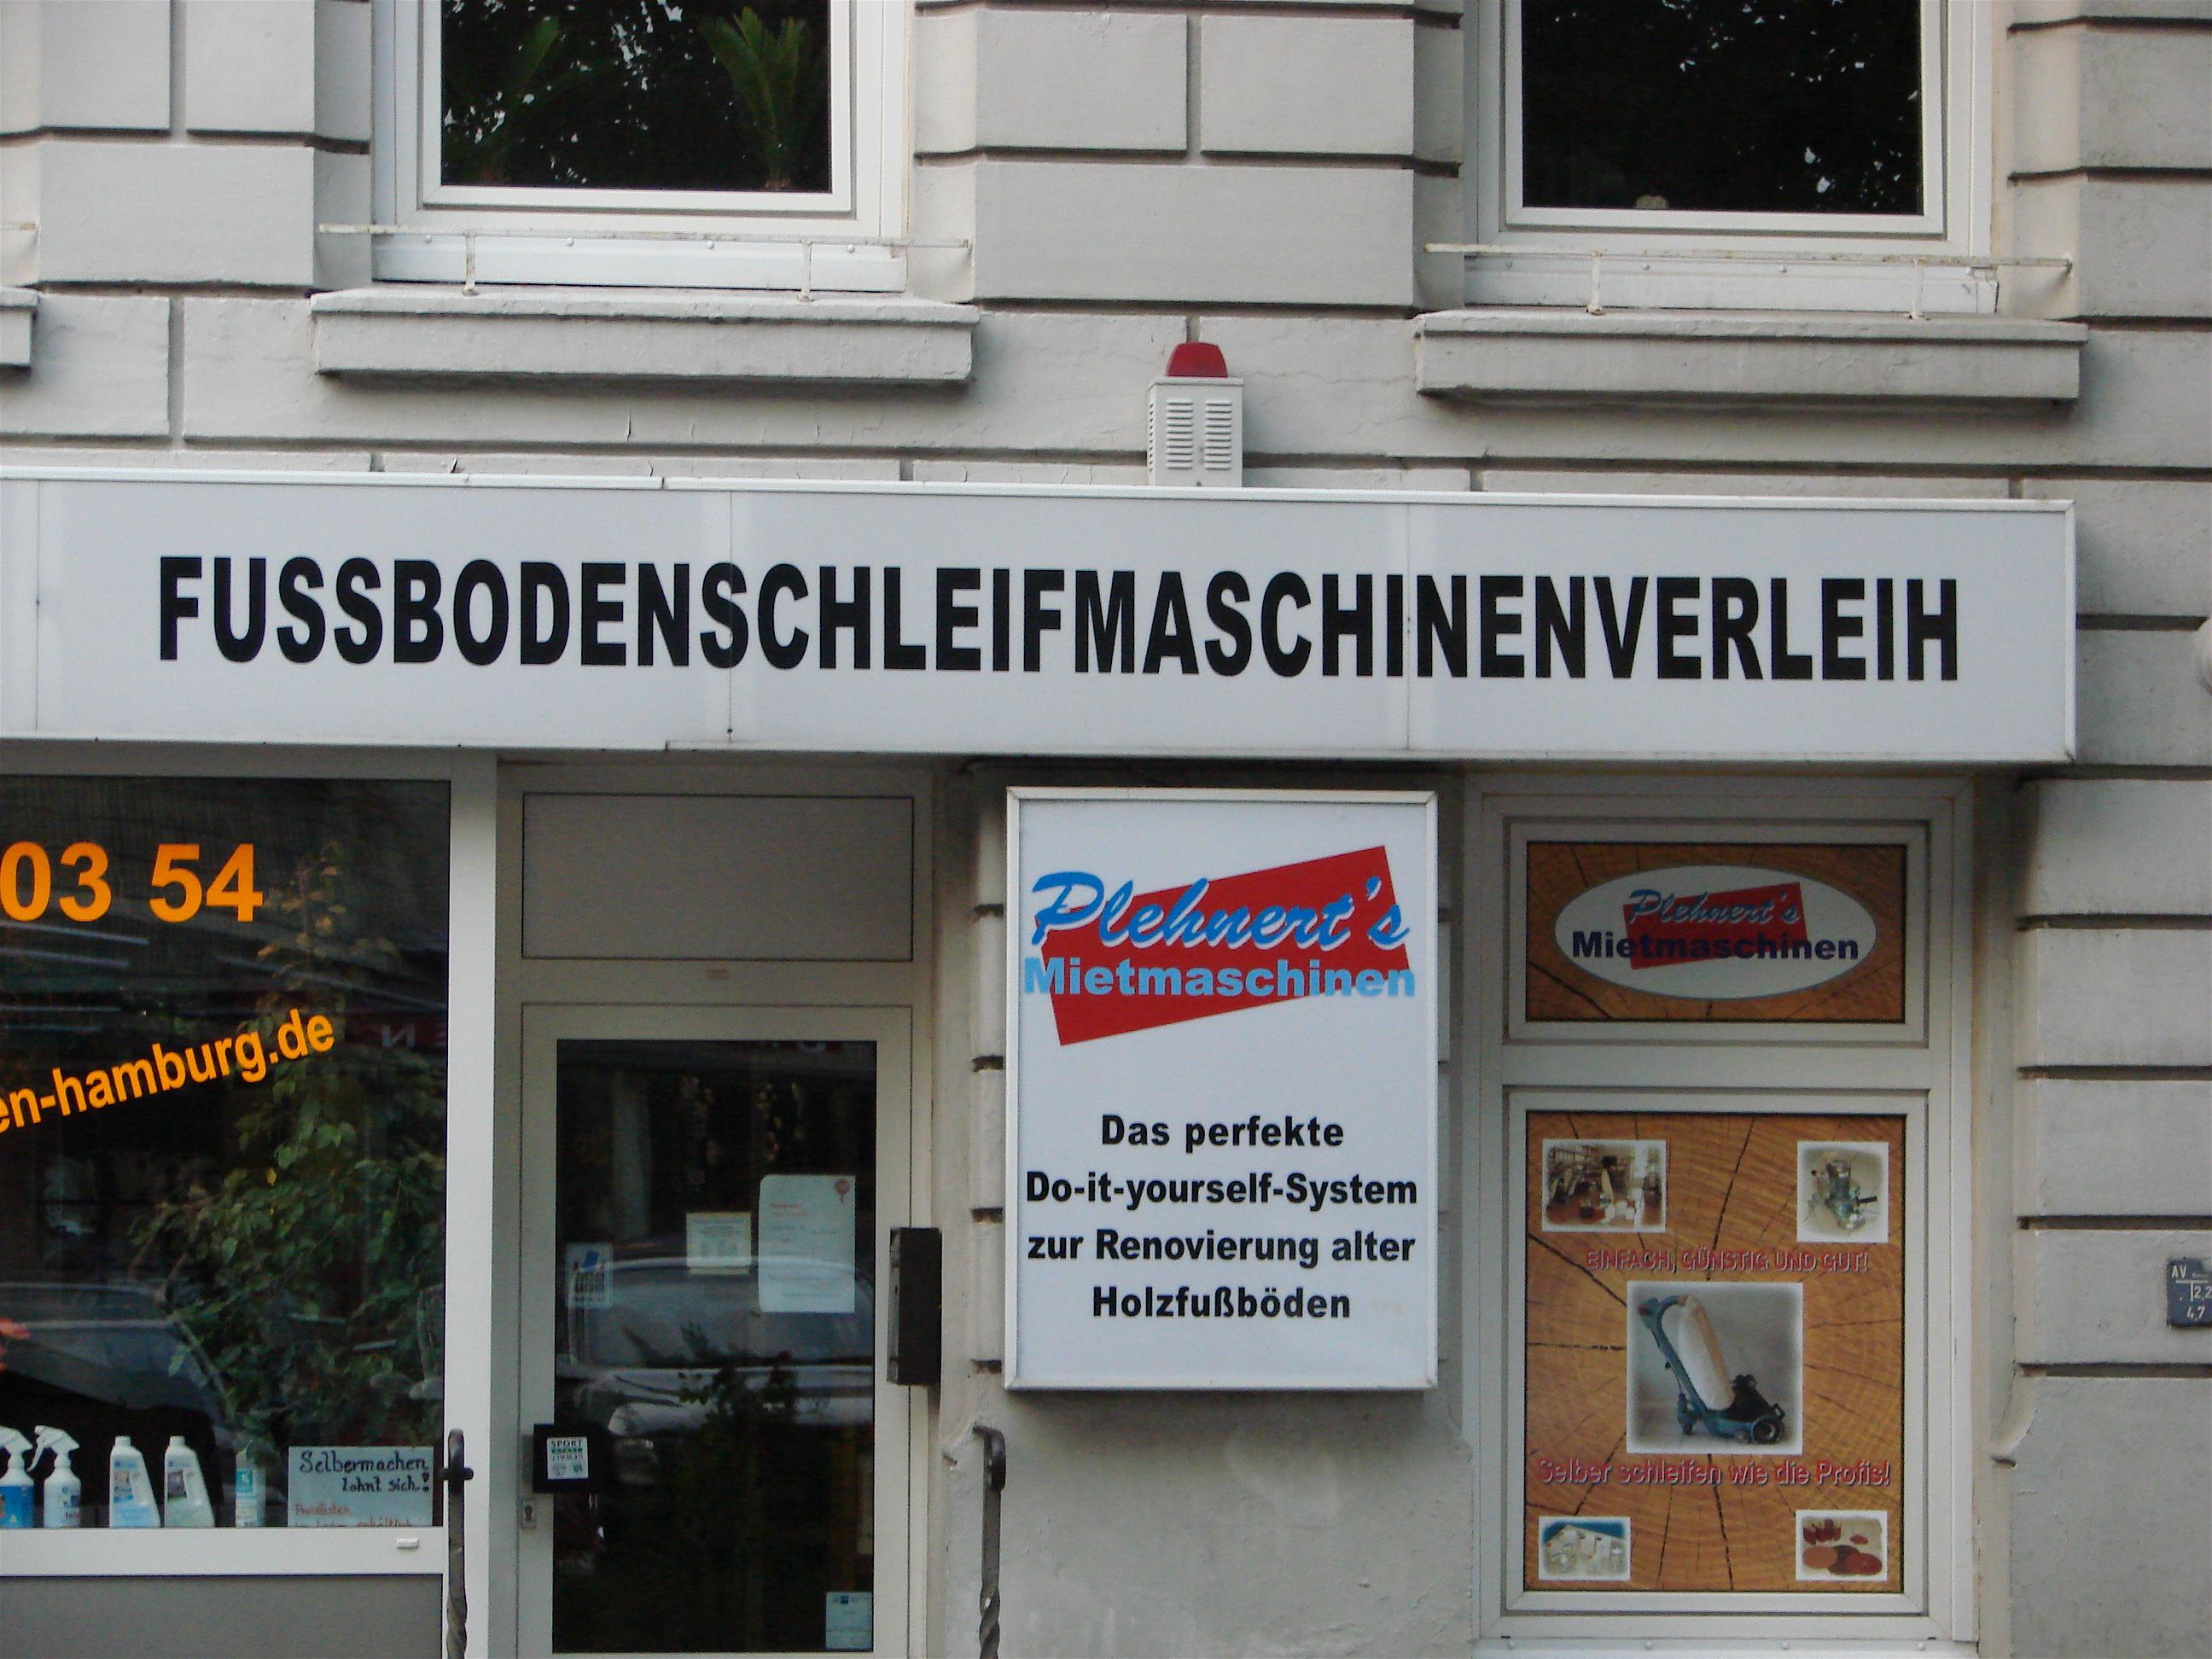 Fussbodenschleifmaschinenverleih file fussbodenschleifmaschinenverleih jpg wikimedia commons,German Word Meme